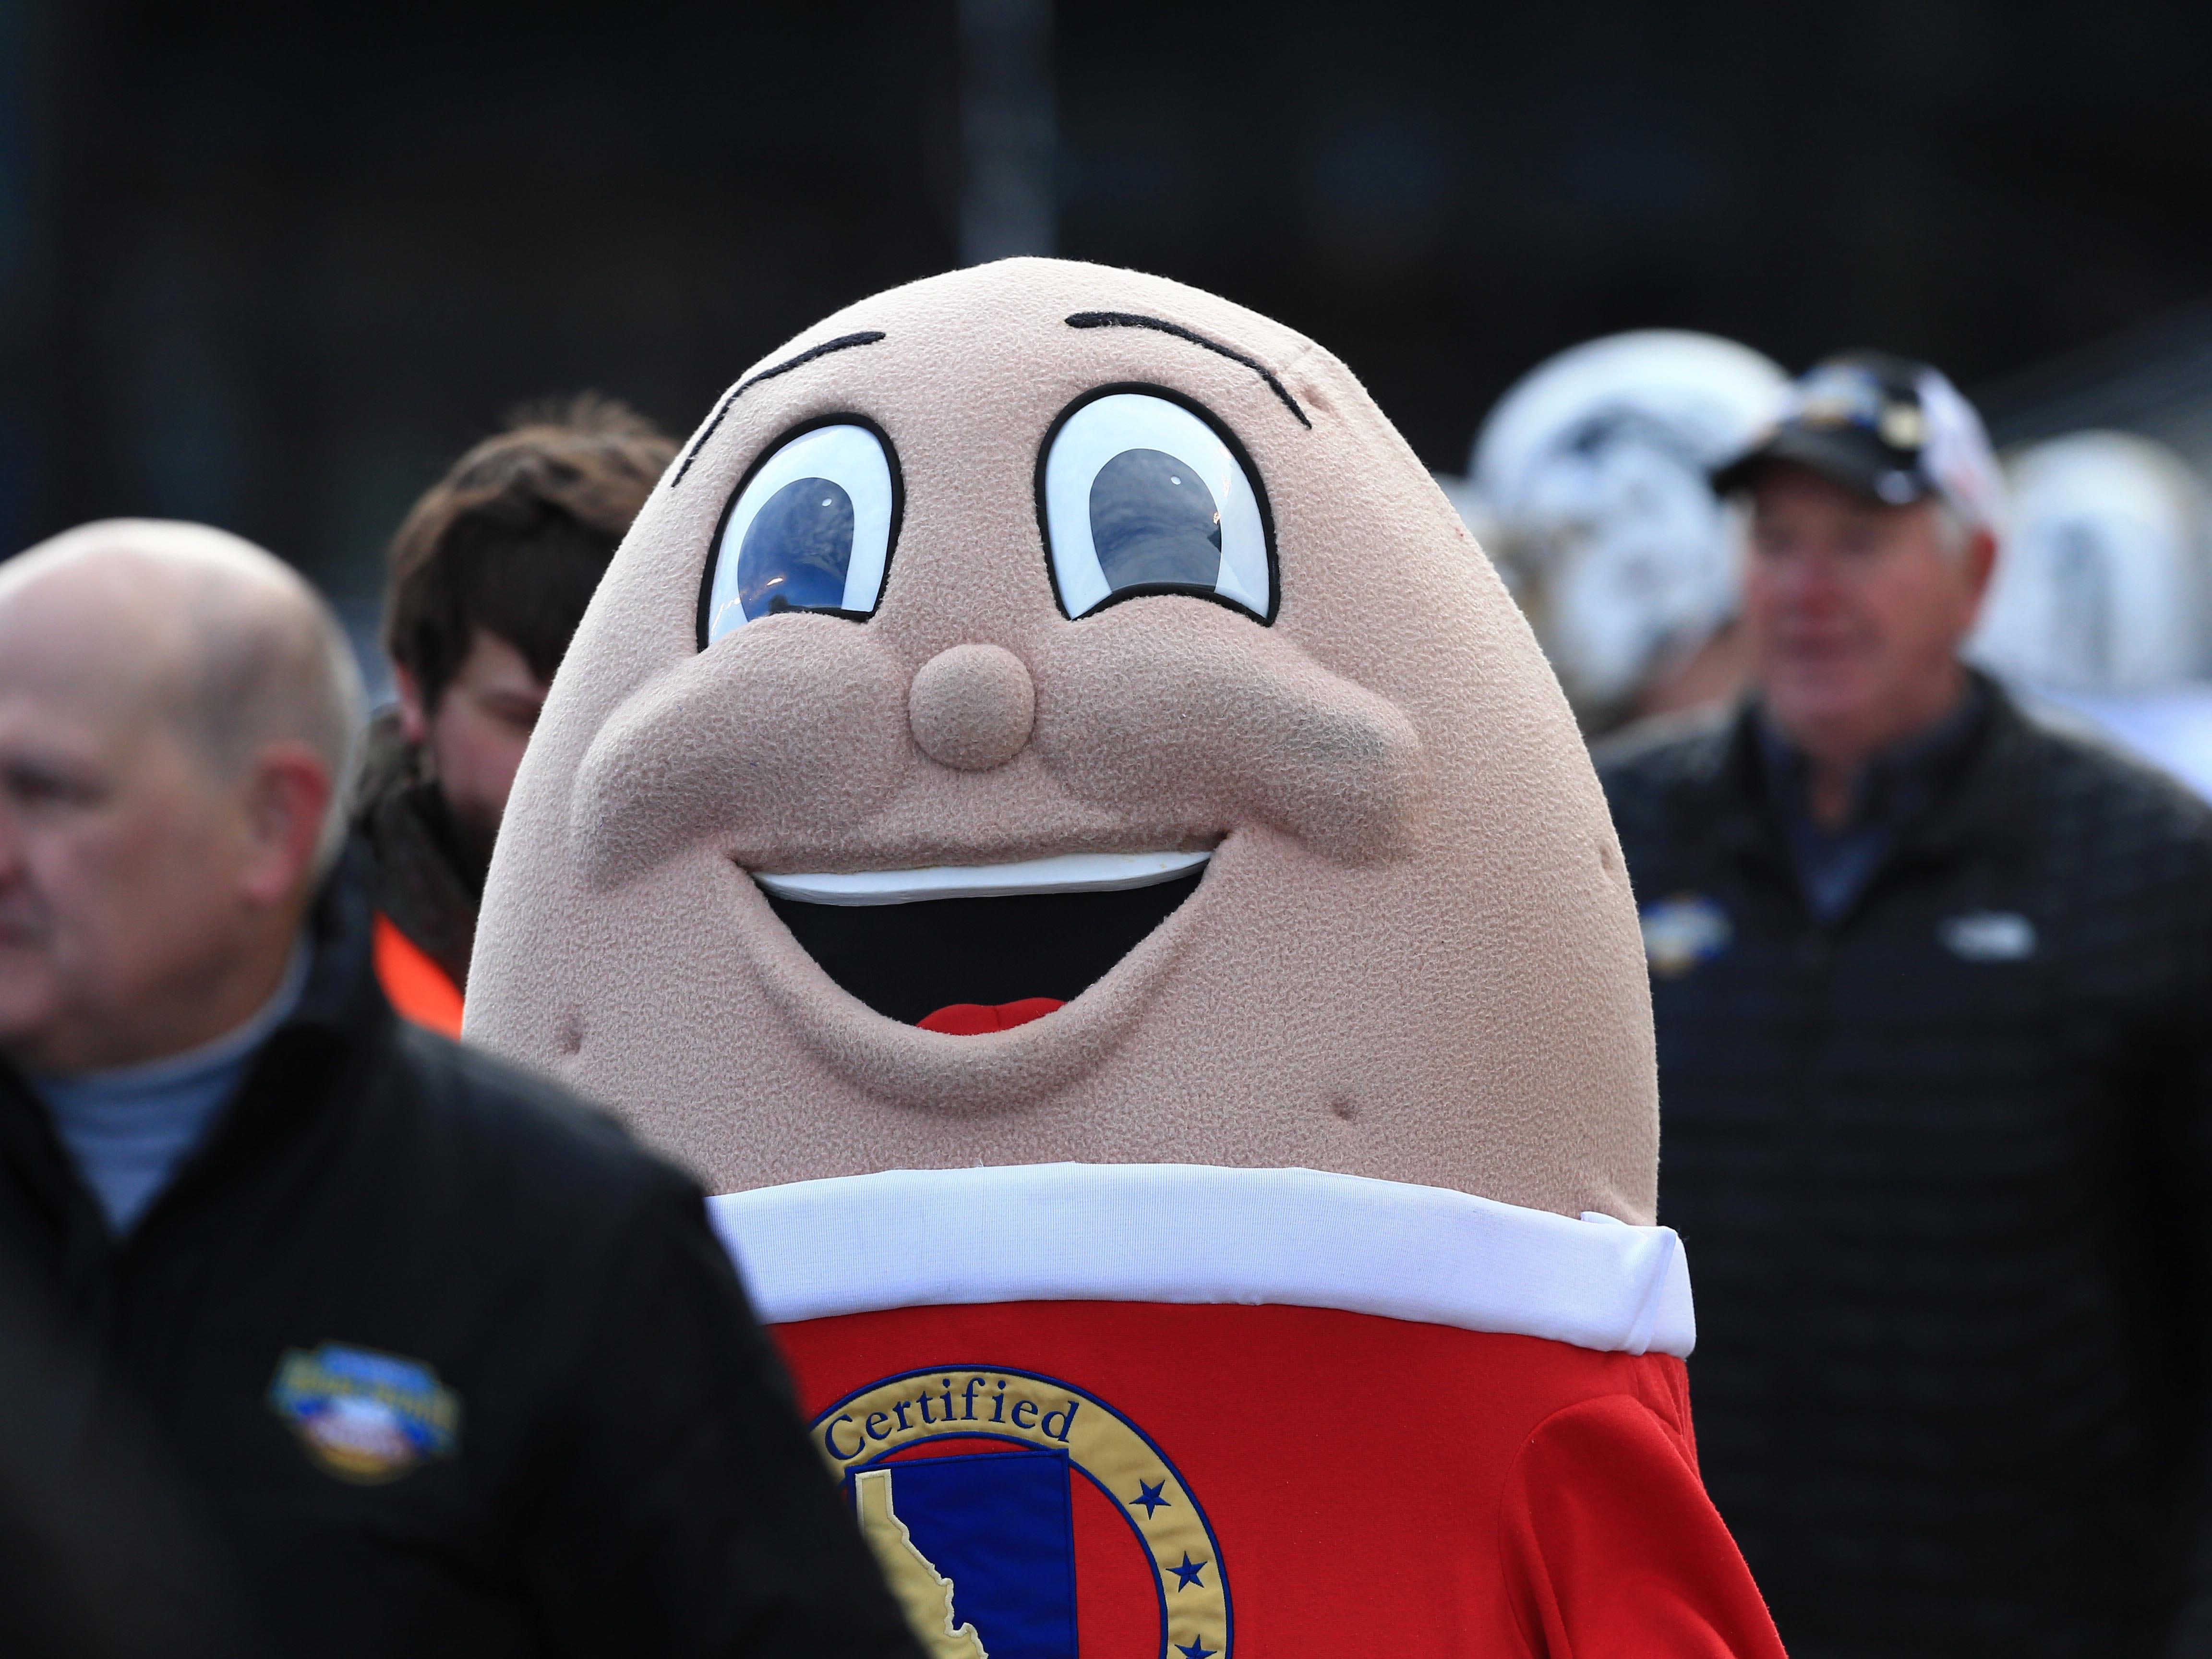 Dec 21, 2018; Boise, ID, United States; Idaho Potato bowl mascot Spuddy Buddy at the 2018 Potato Bowl between BYU and Western Michigan at Albertsons Stadium. Mandatory Credit: Brian Losness-USA TODAY Sports